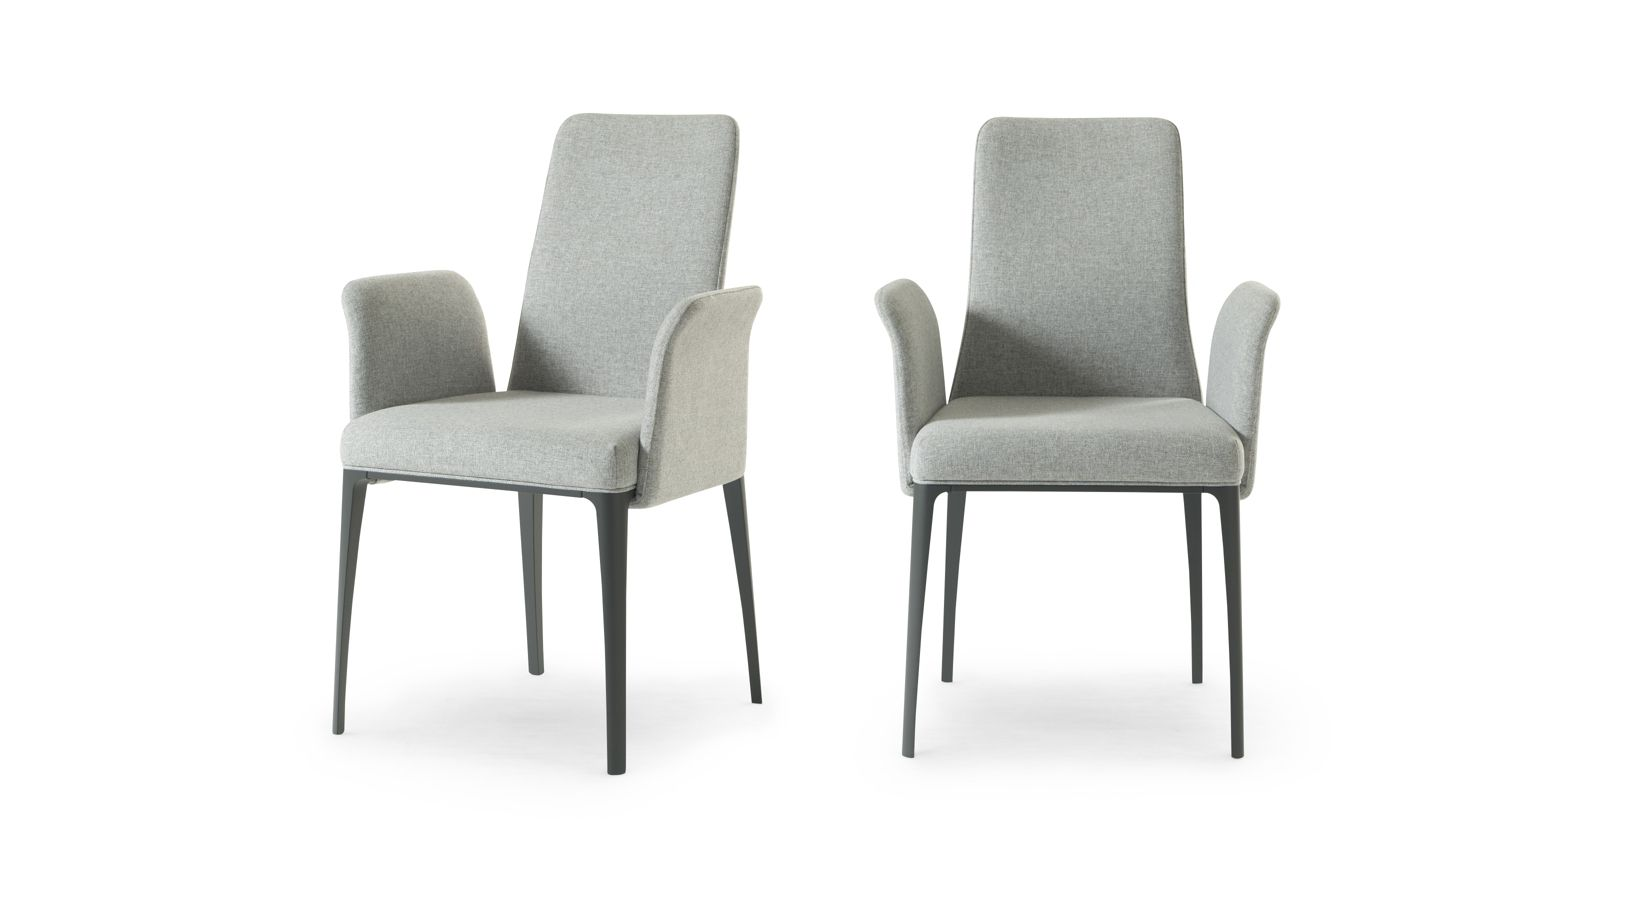 aida chair roche bobois. Black Bedroom Furniture Sets. Home Design Ideas